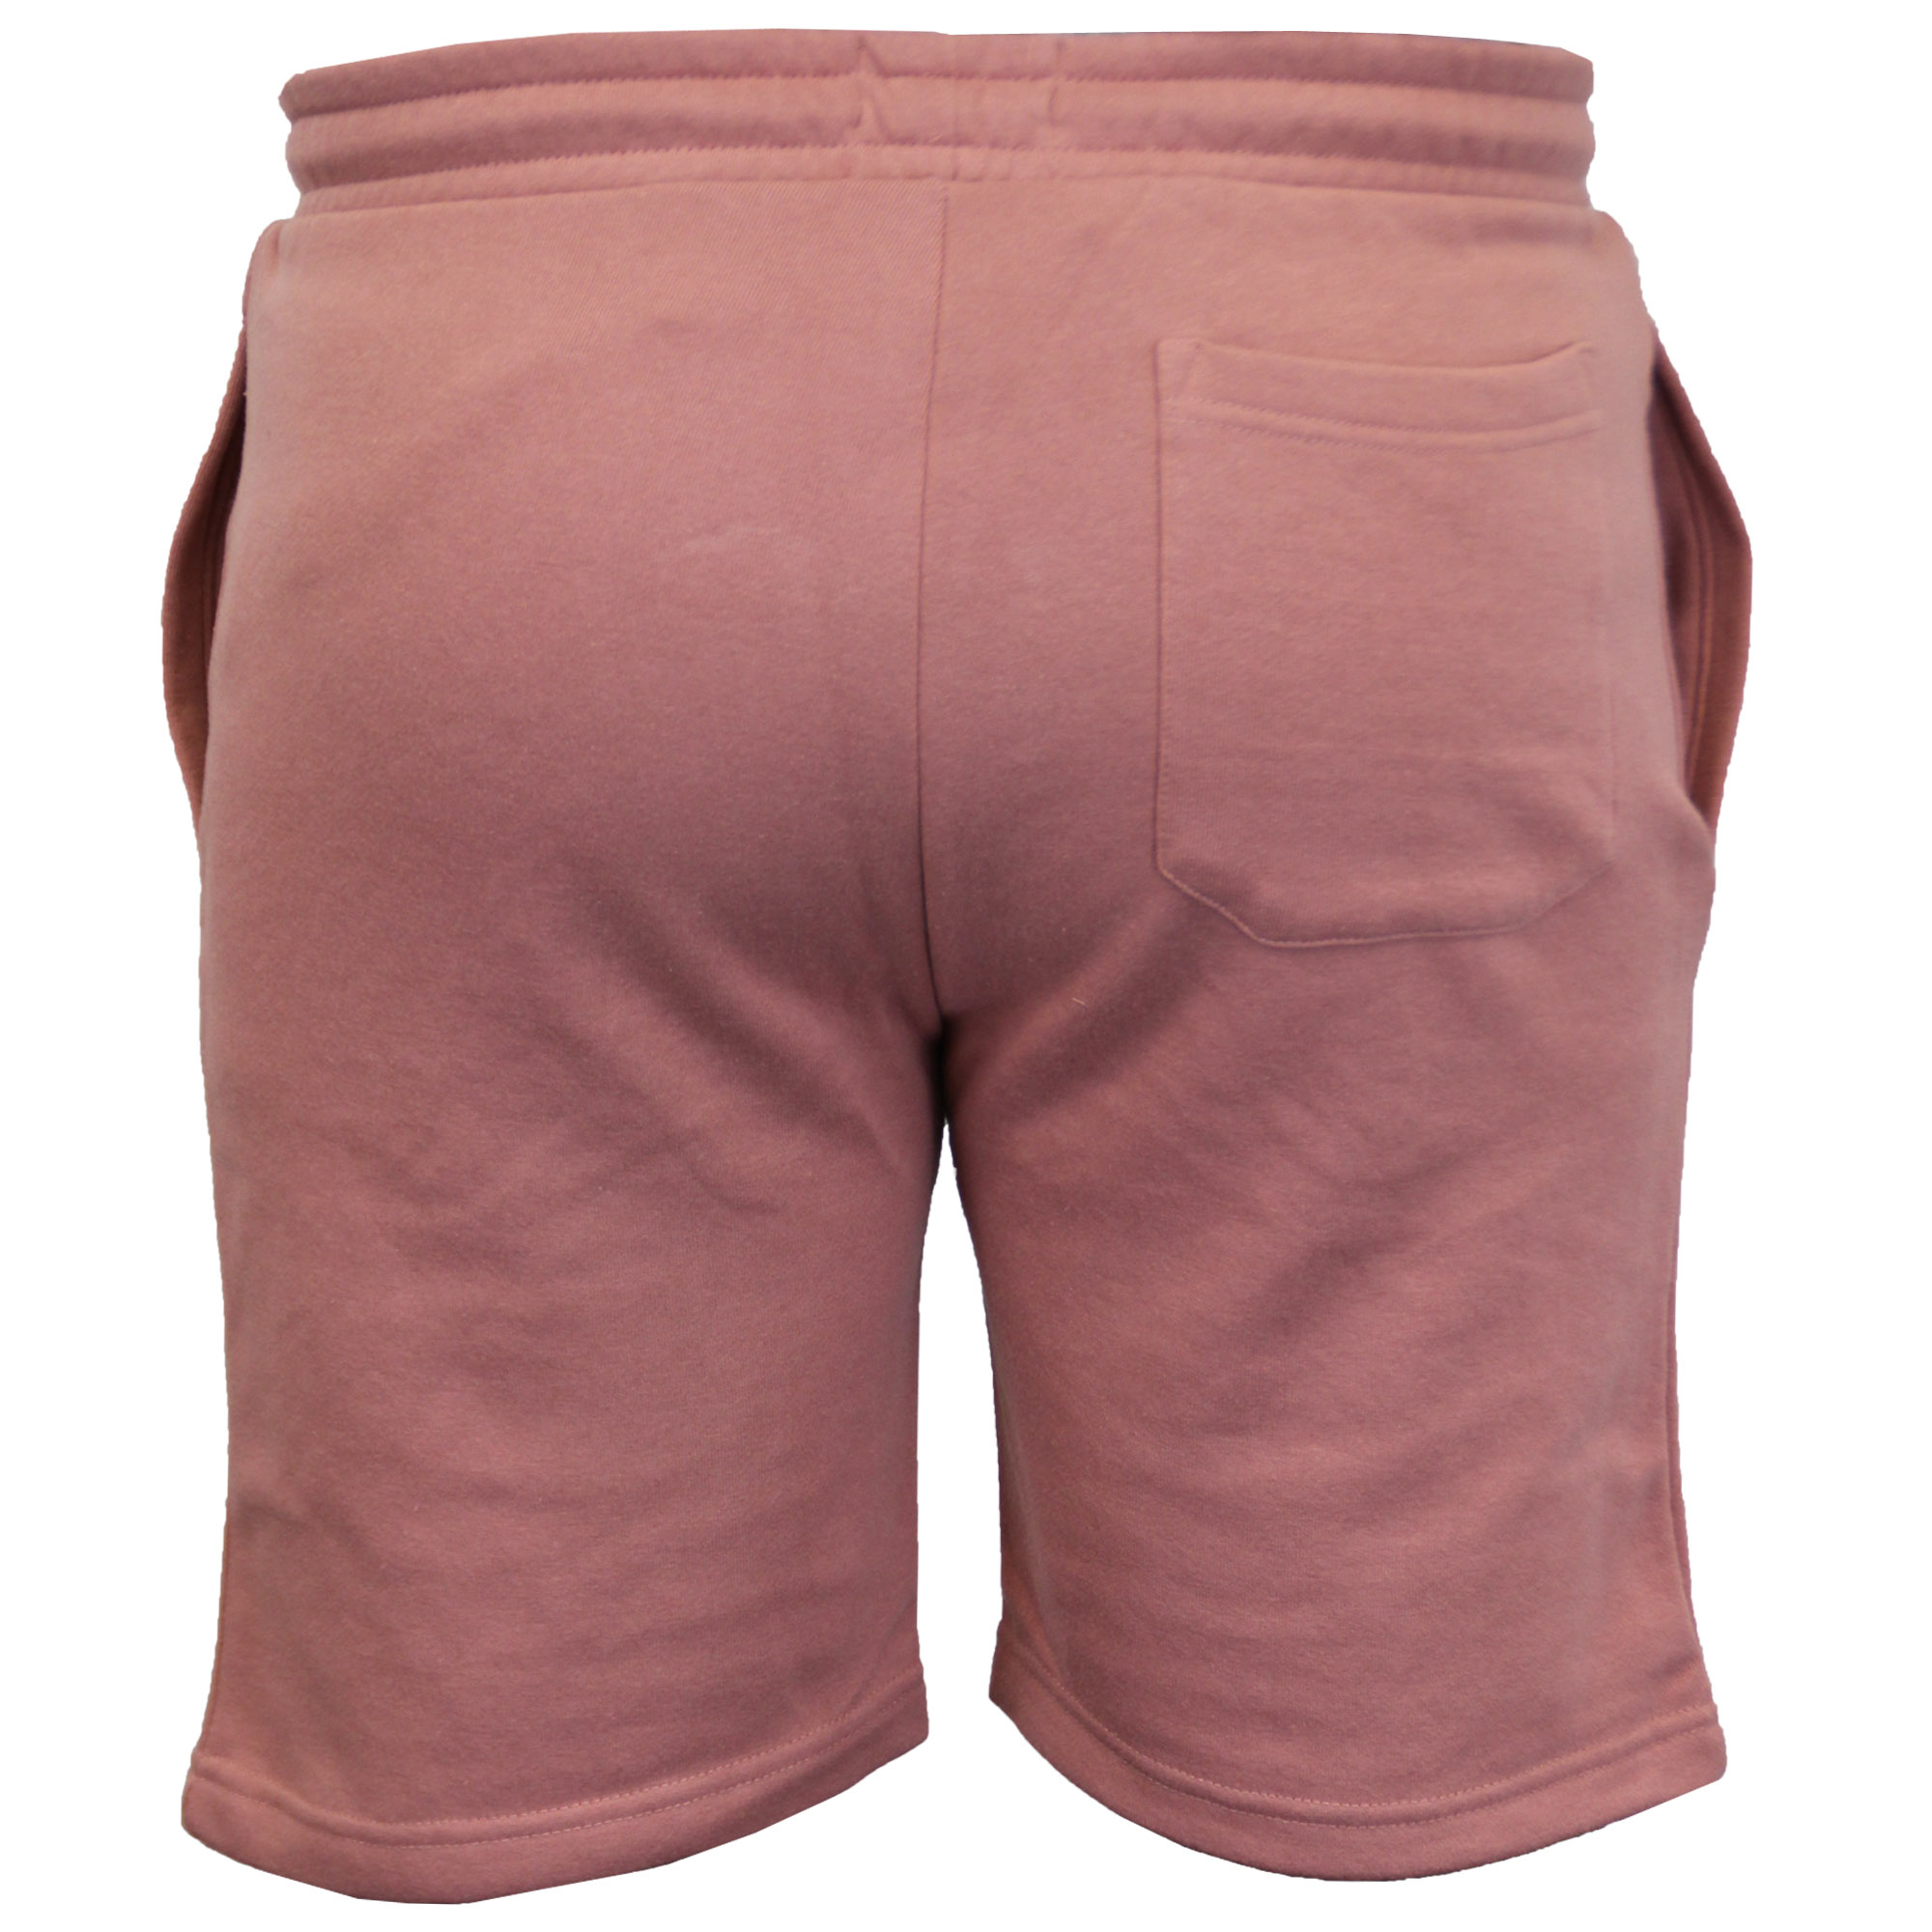 Mens-Jogger-Shorts-Tarley-by-Brave-Soul-Knee-Length-Casual-Fleece-Lined-Summer thumbnail 47